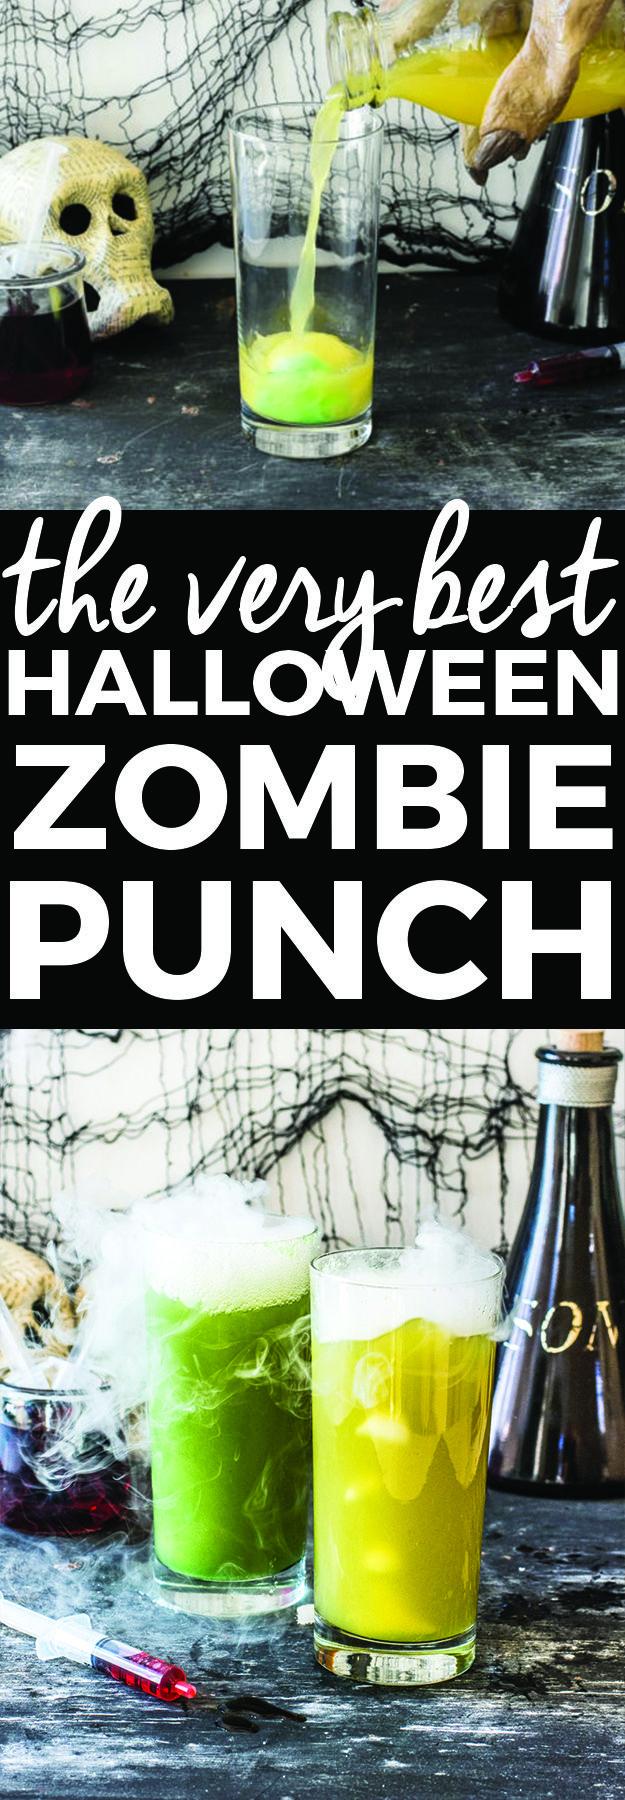 Halloween Zombie Punch Recipe | halloween recipes, halloween punch recipes, halloween drink recipe turn non-alcoholic into alcohol  any spirits you like!!!!